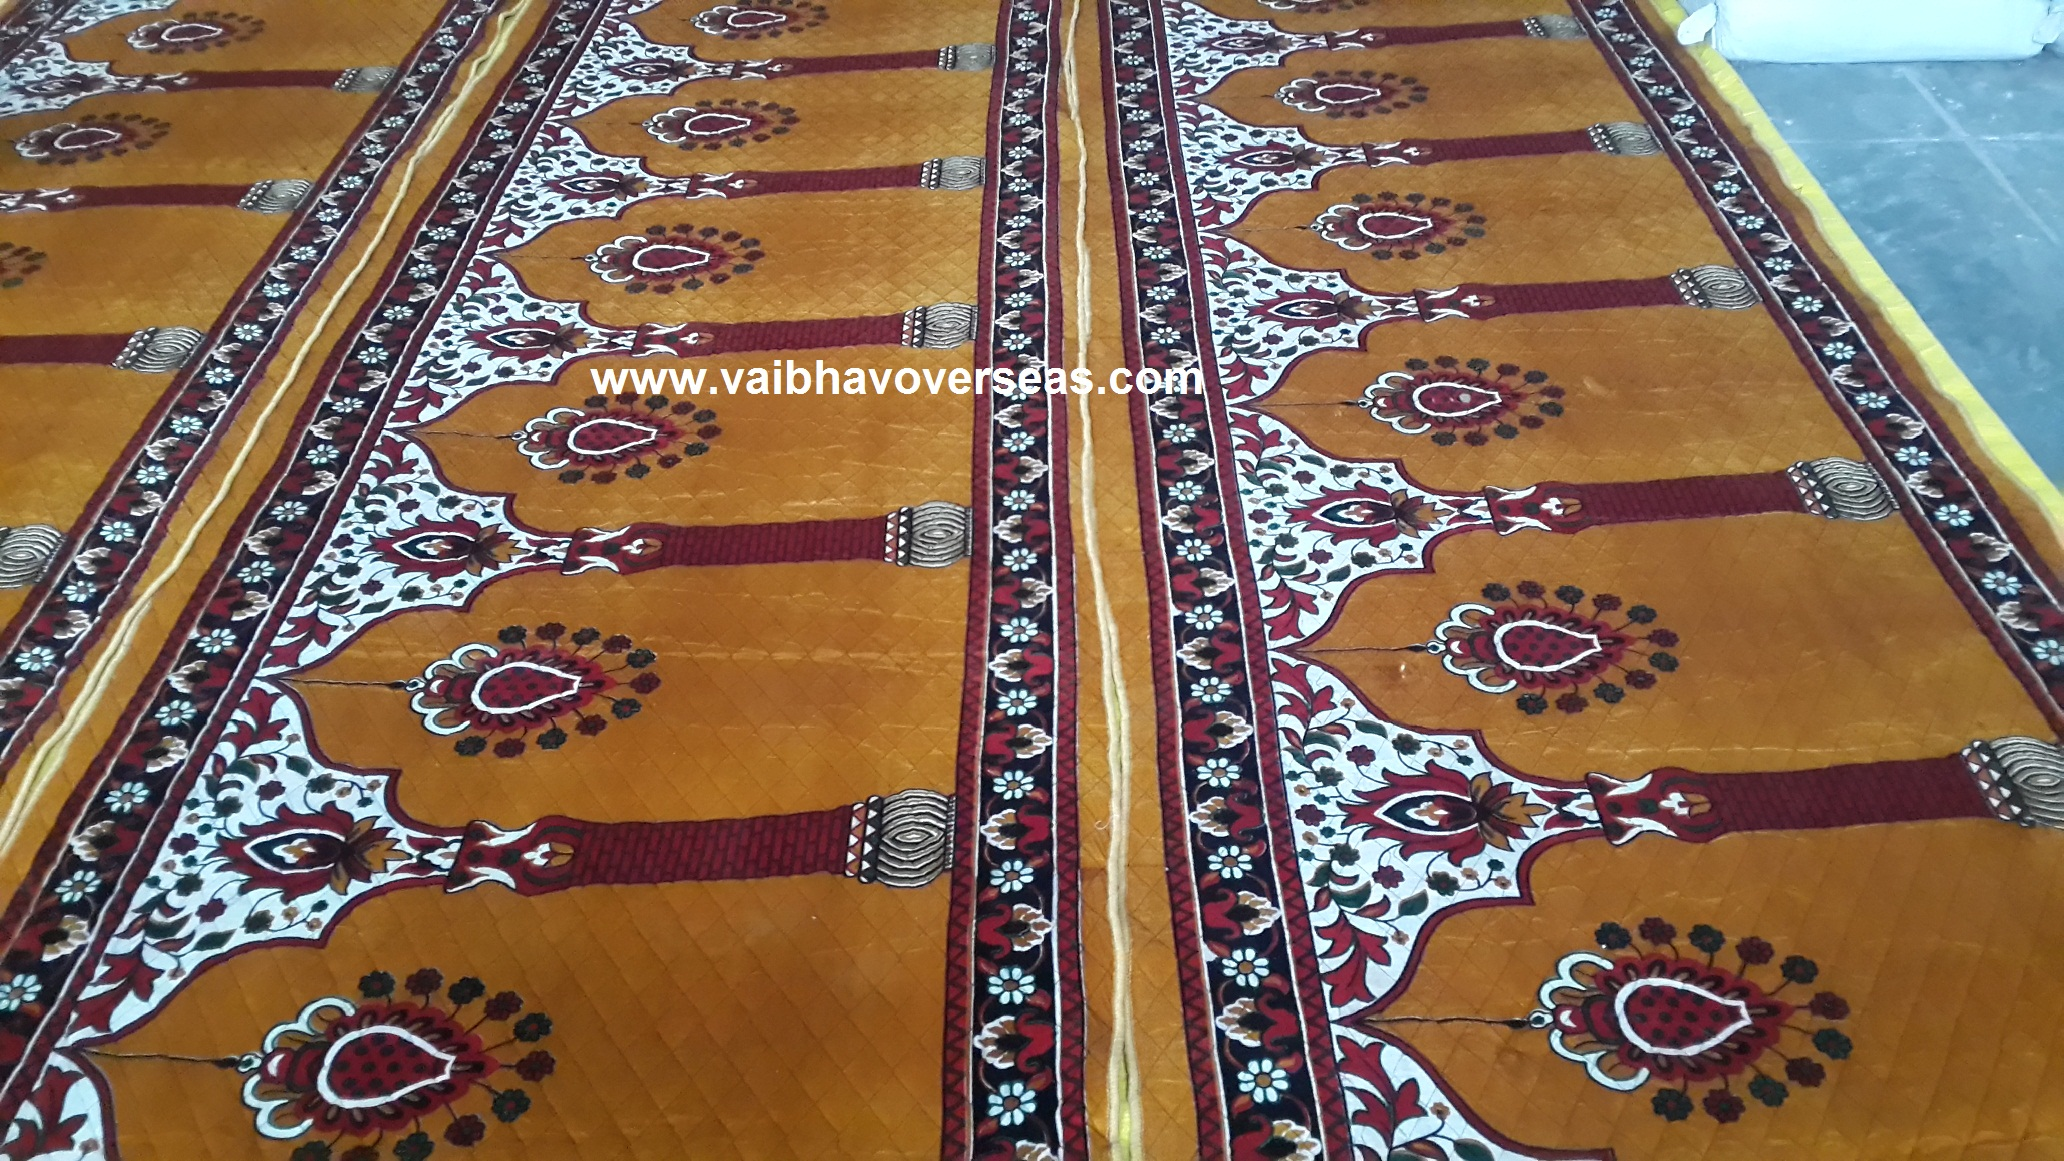 Mosque Carpets Suppliers Designer Carpets Masjid